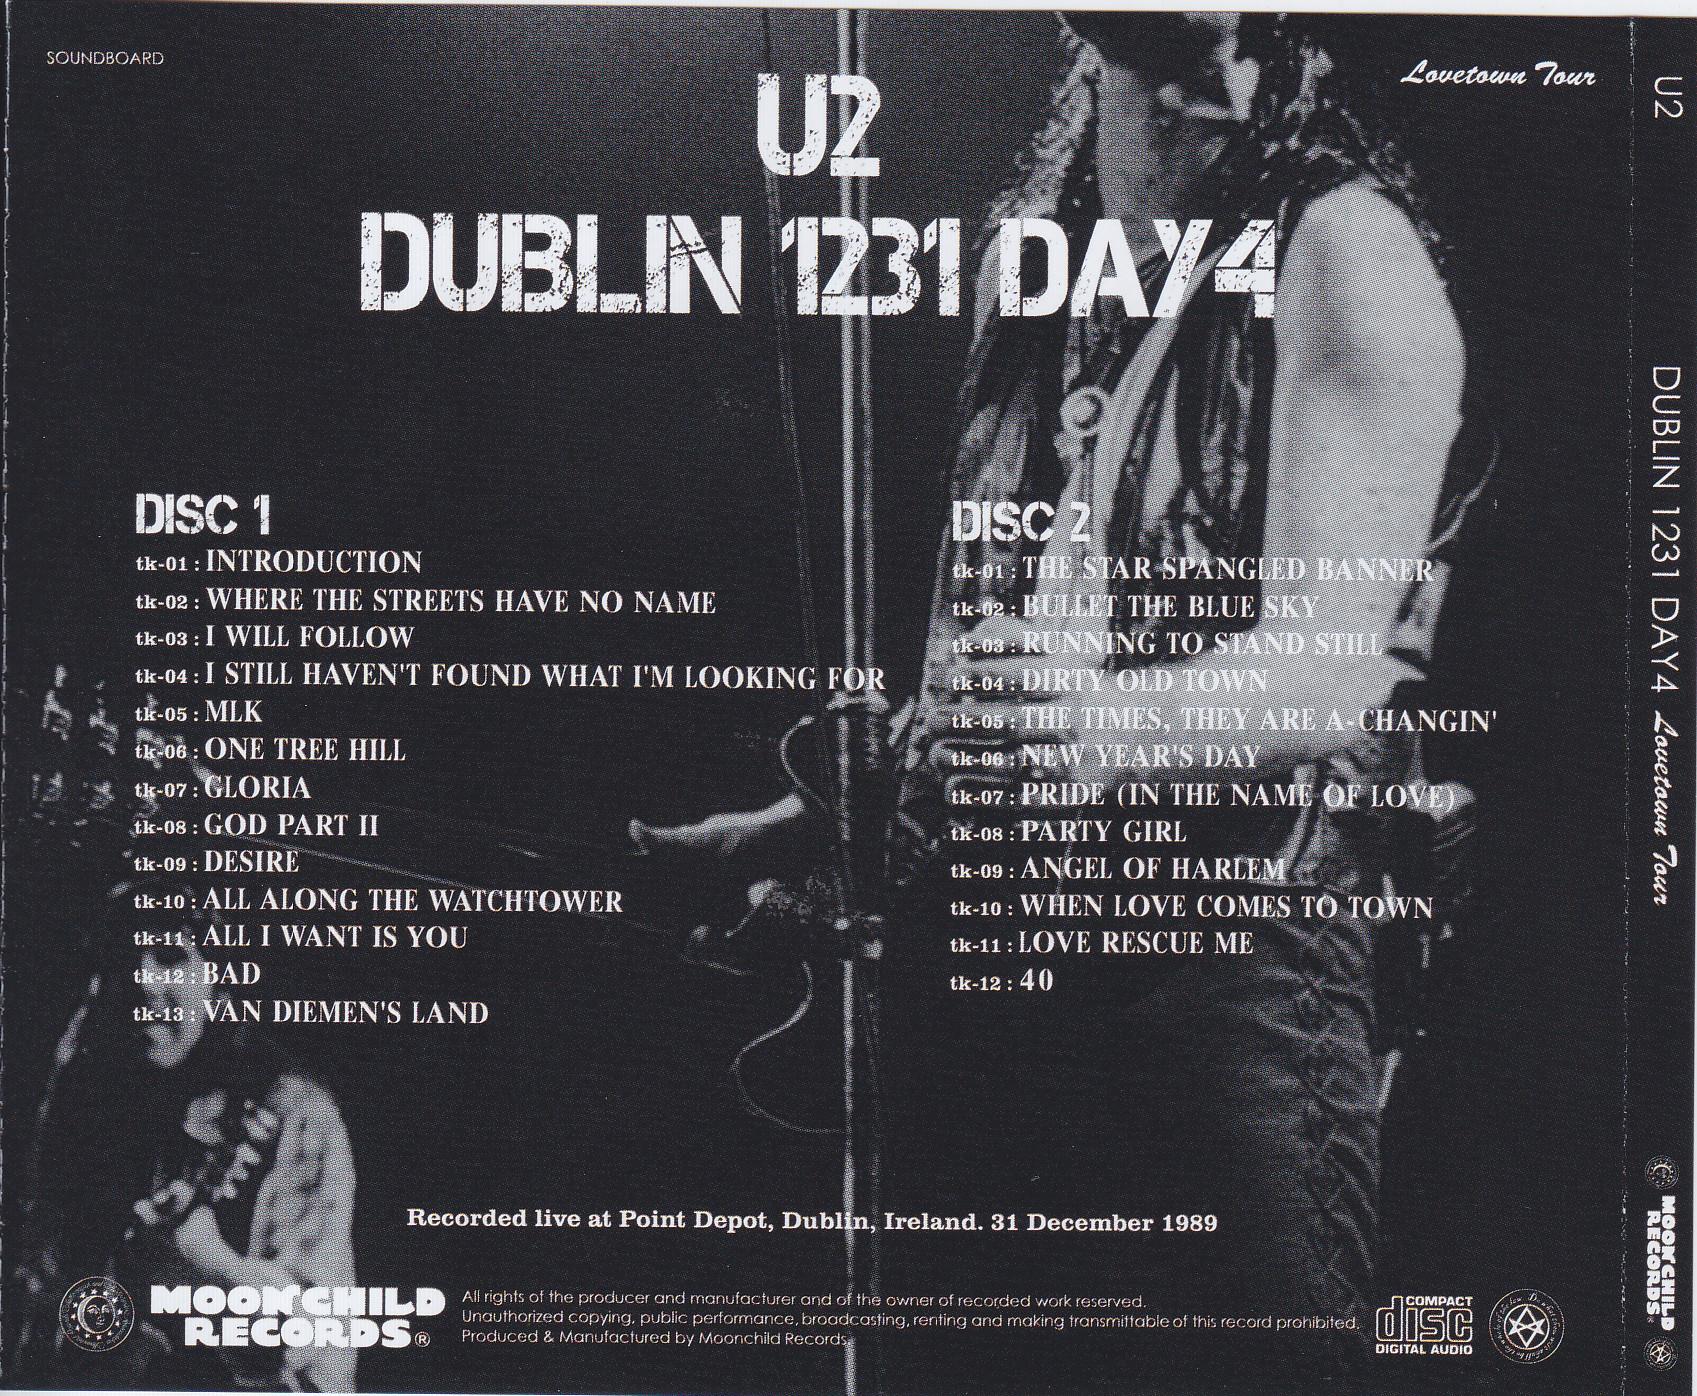 U2 - Dublin 1231 Day 4 Lovetown Tour (2CD) Moonchild Records  MC 048